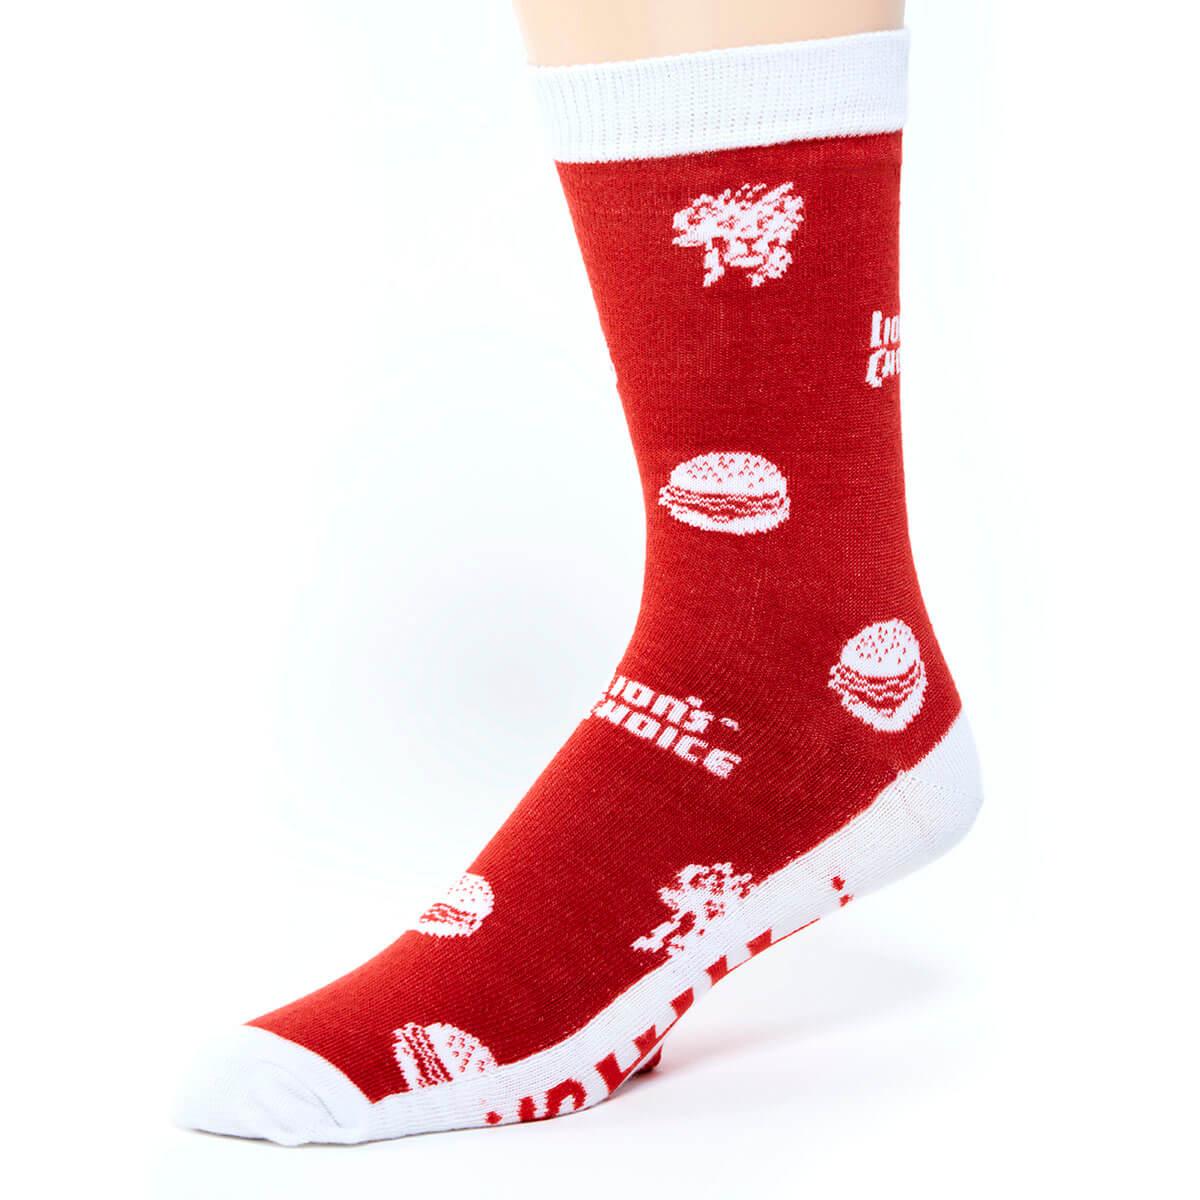 Beef Socks